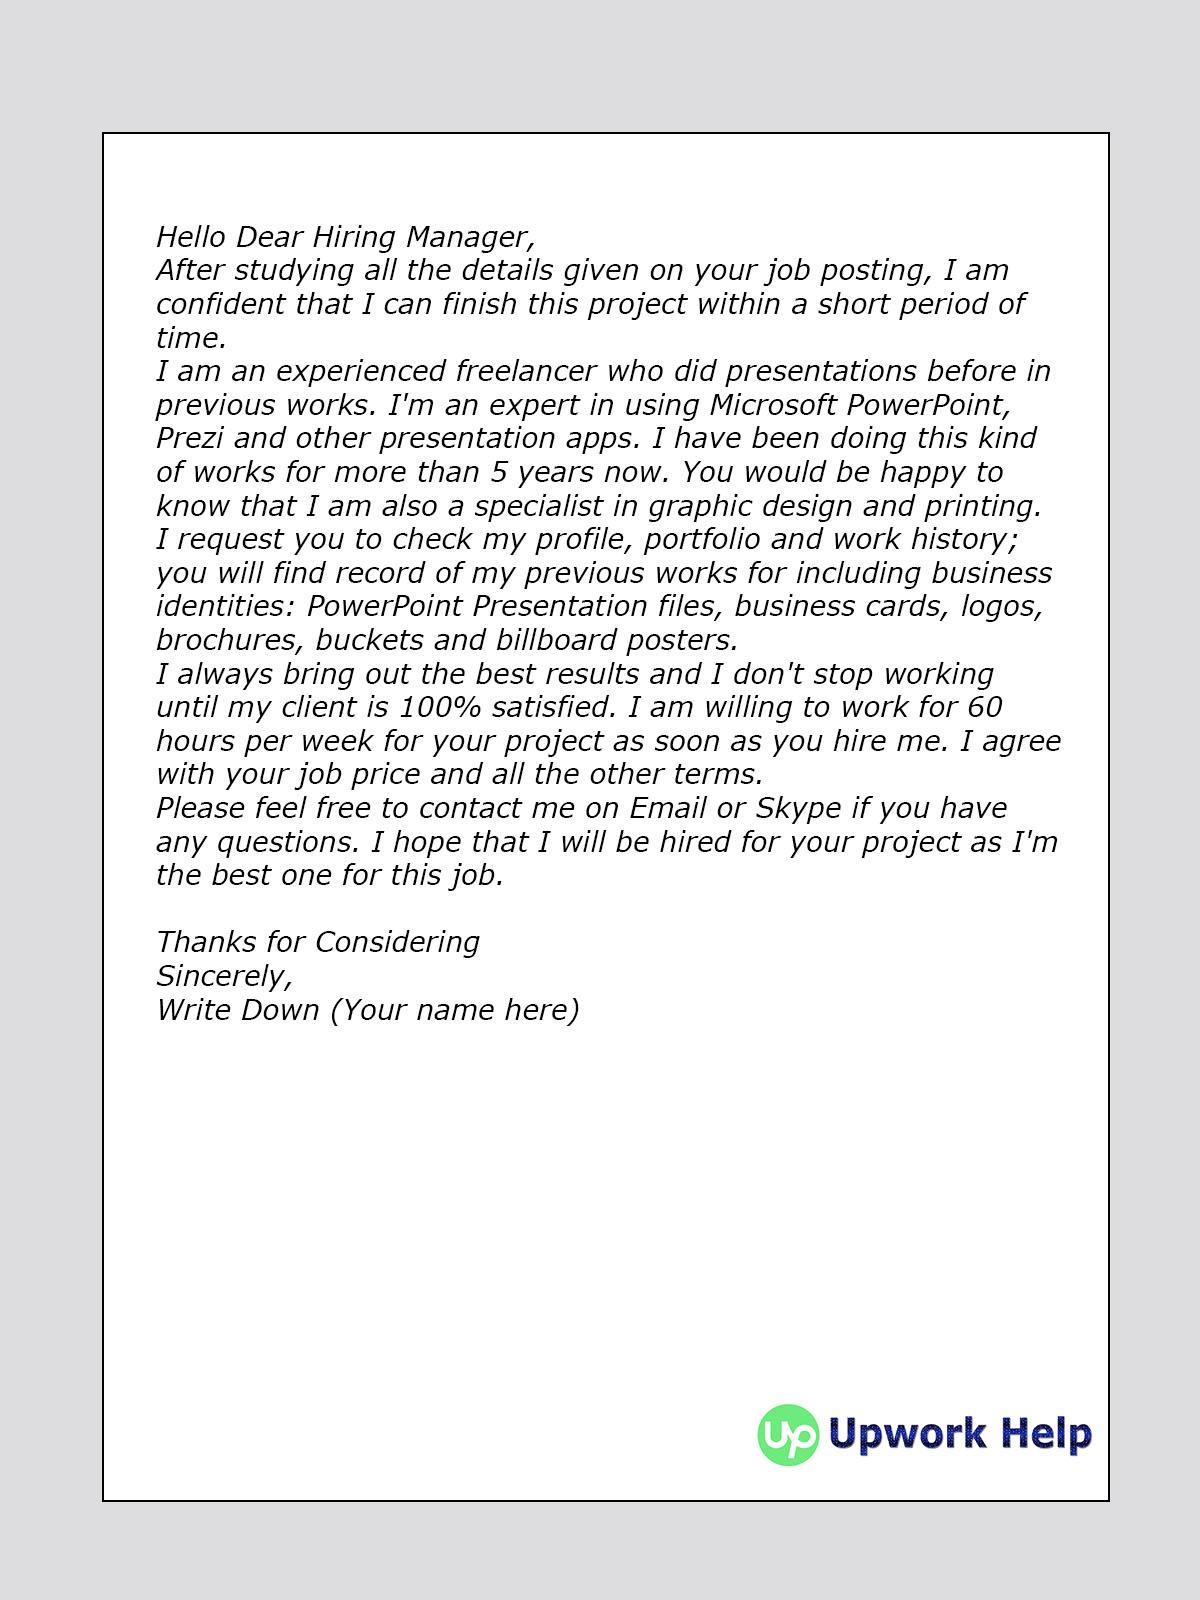 Cover Letter Sample for MS PowerPoint Presentation - Upwork Help